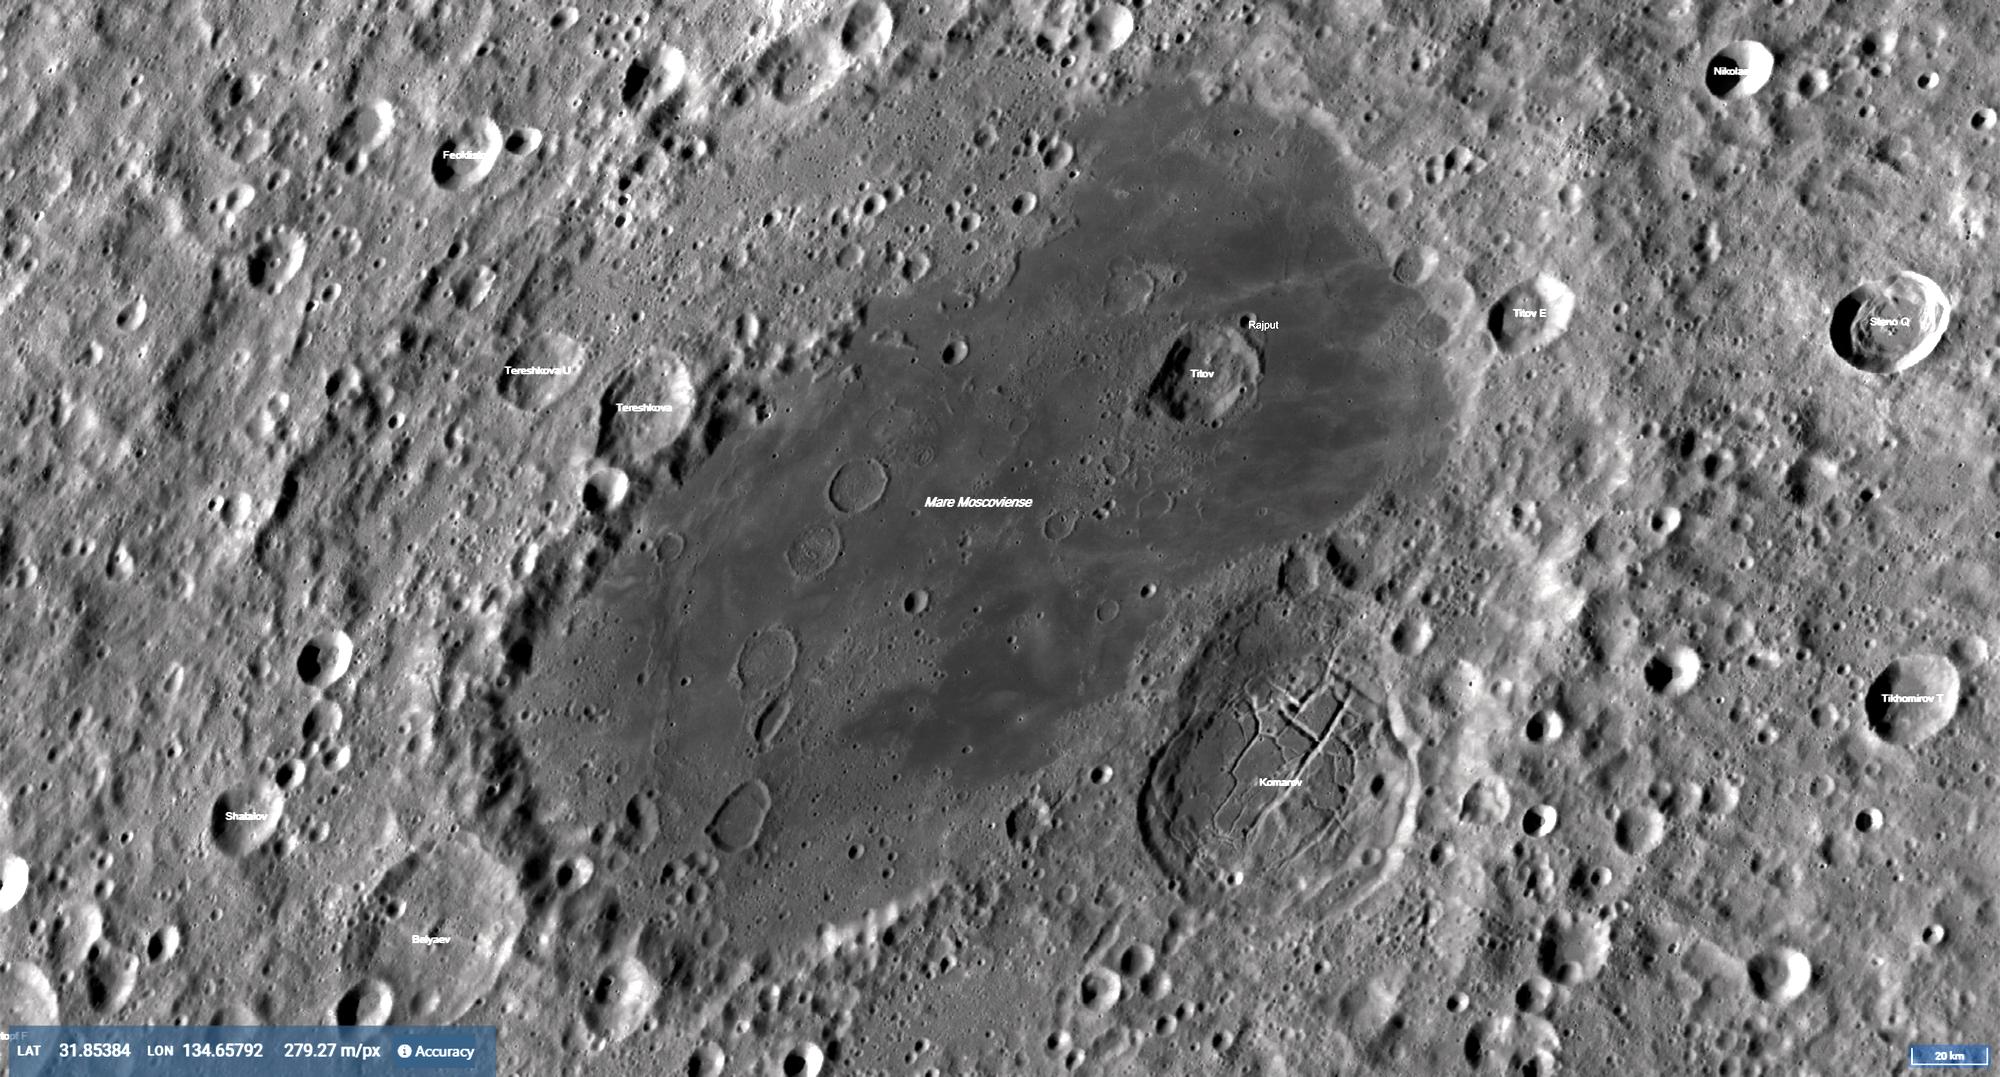 Moscoviense Region Lunar Photomap